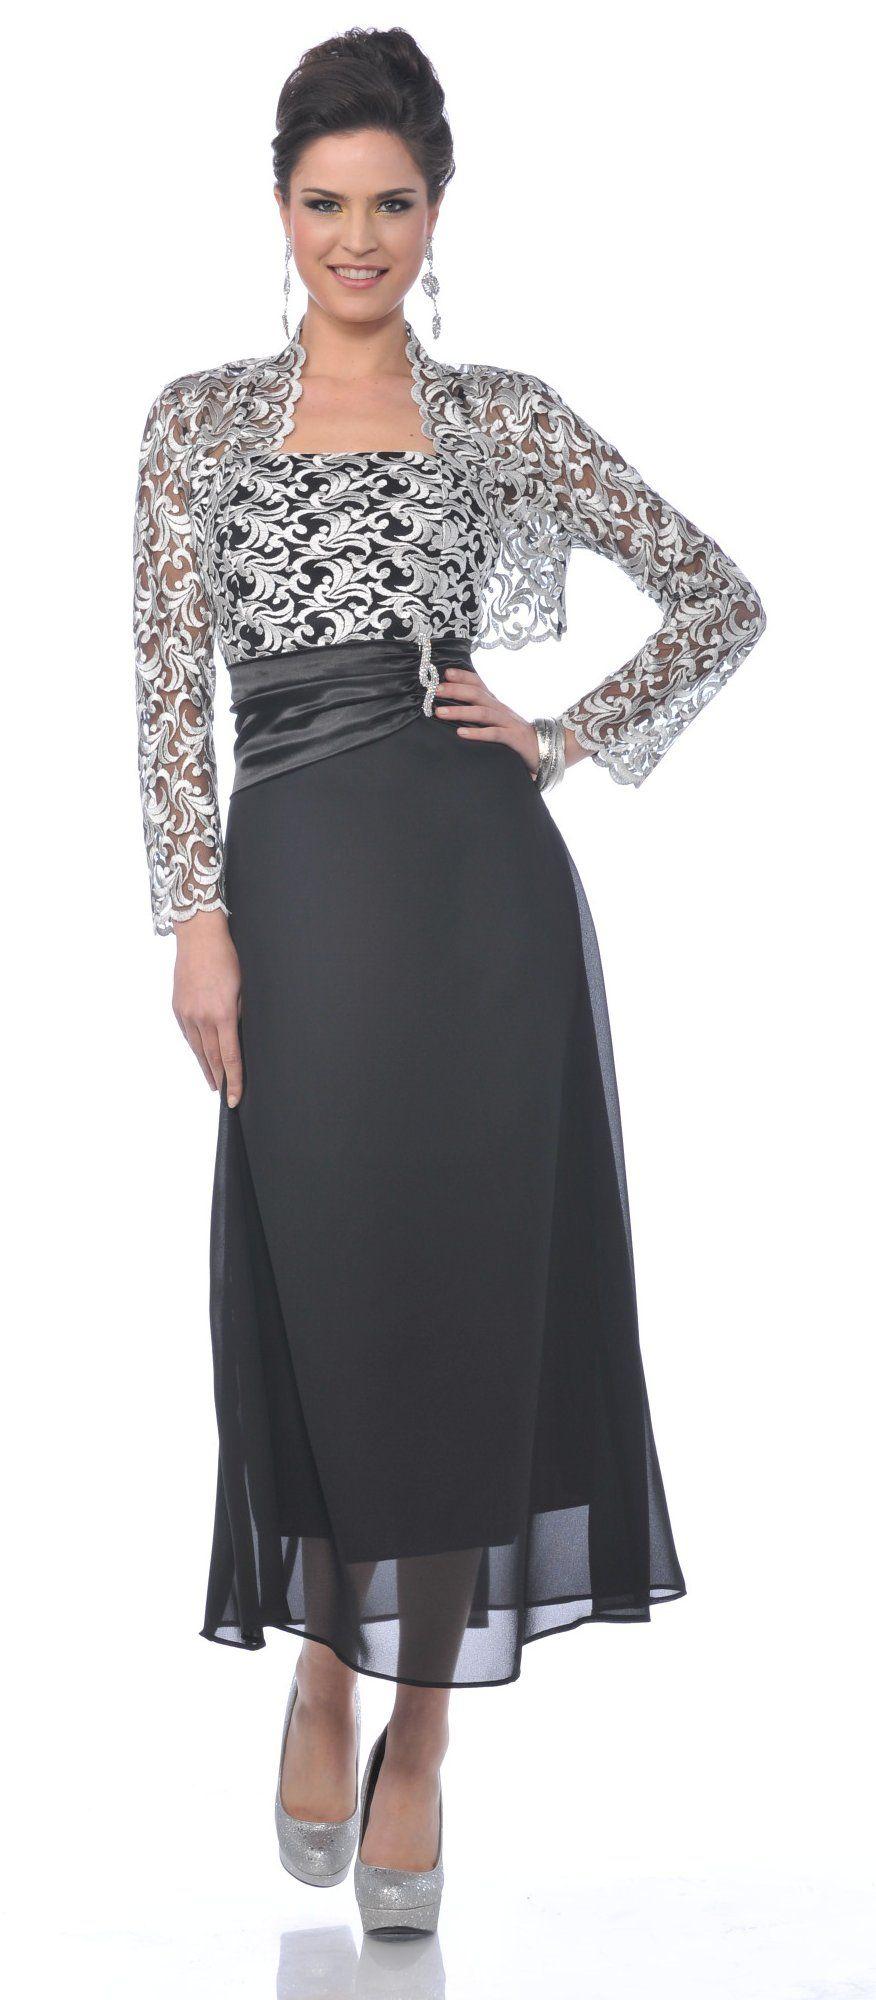 Black/Silver Embroider Top Mother of Bride Dress Tea